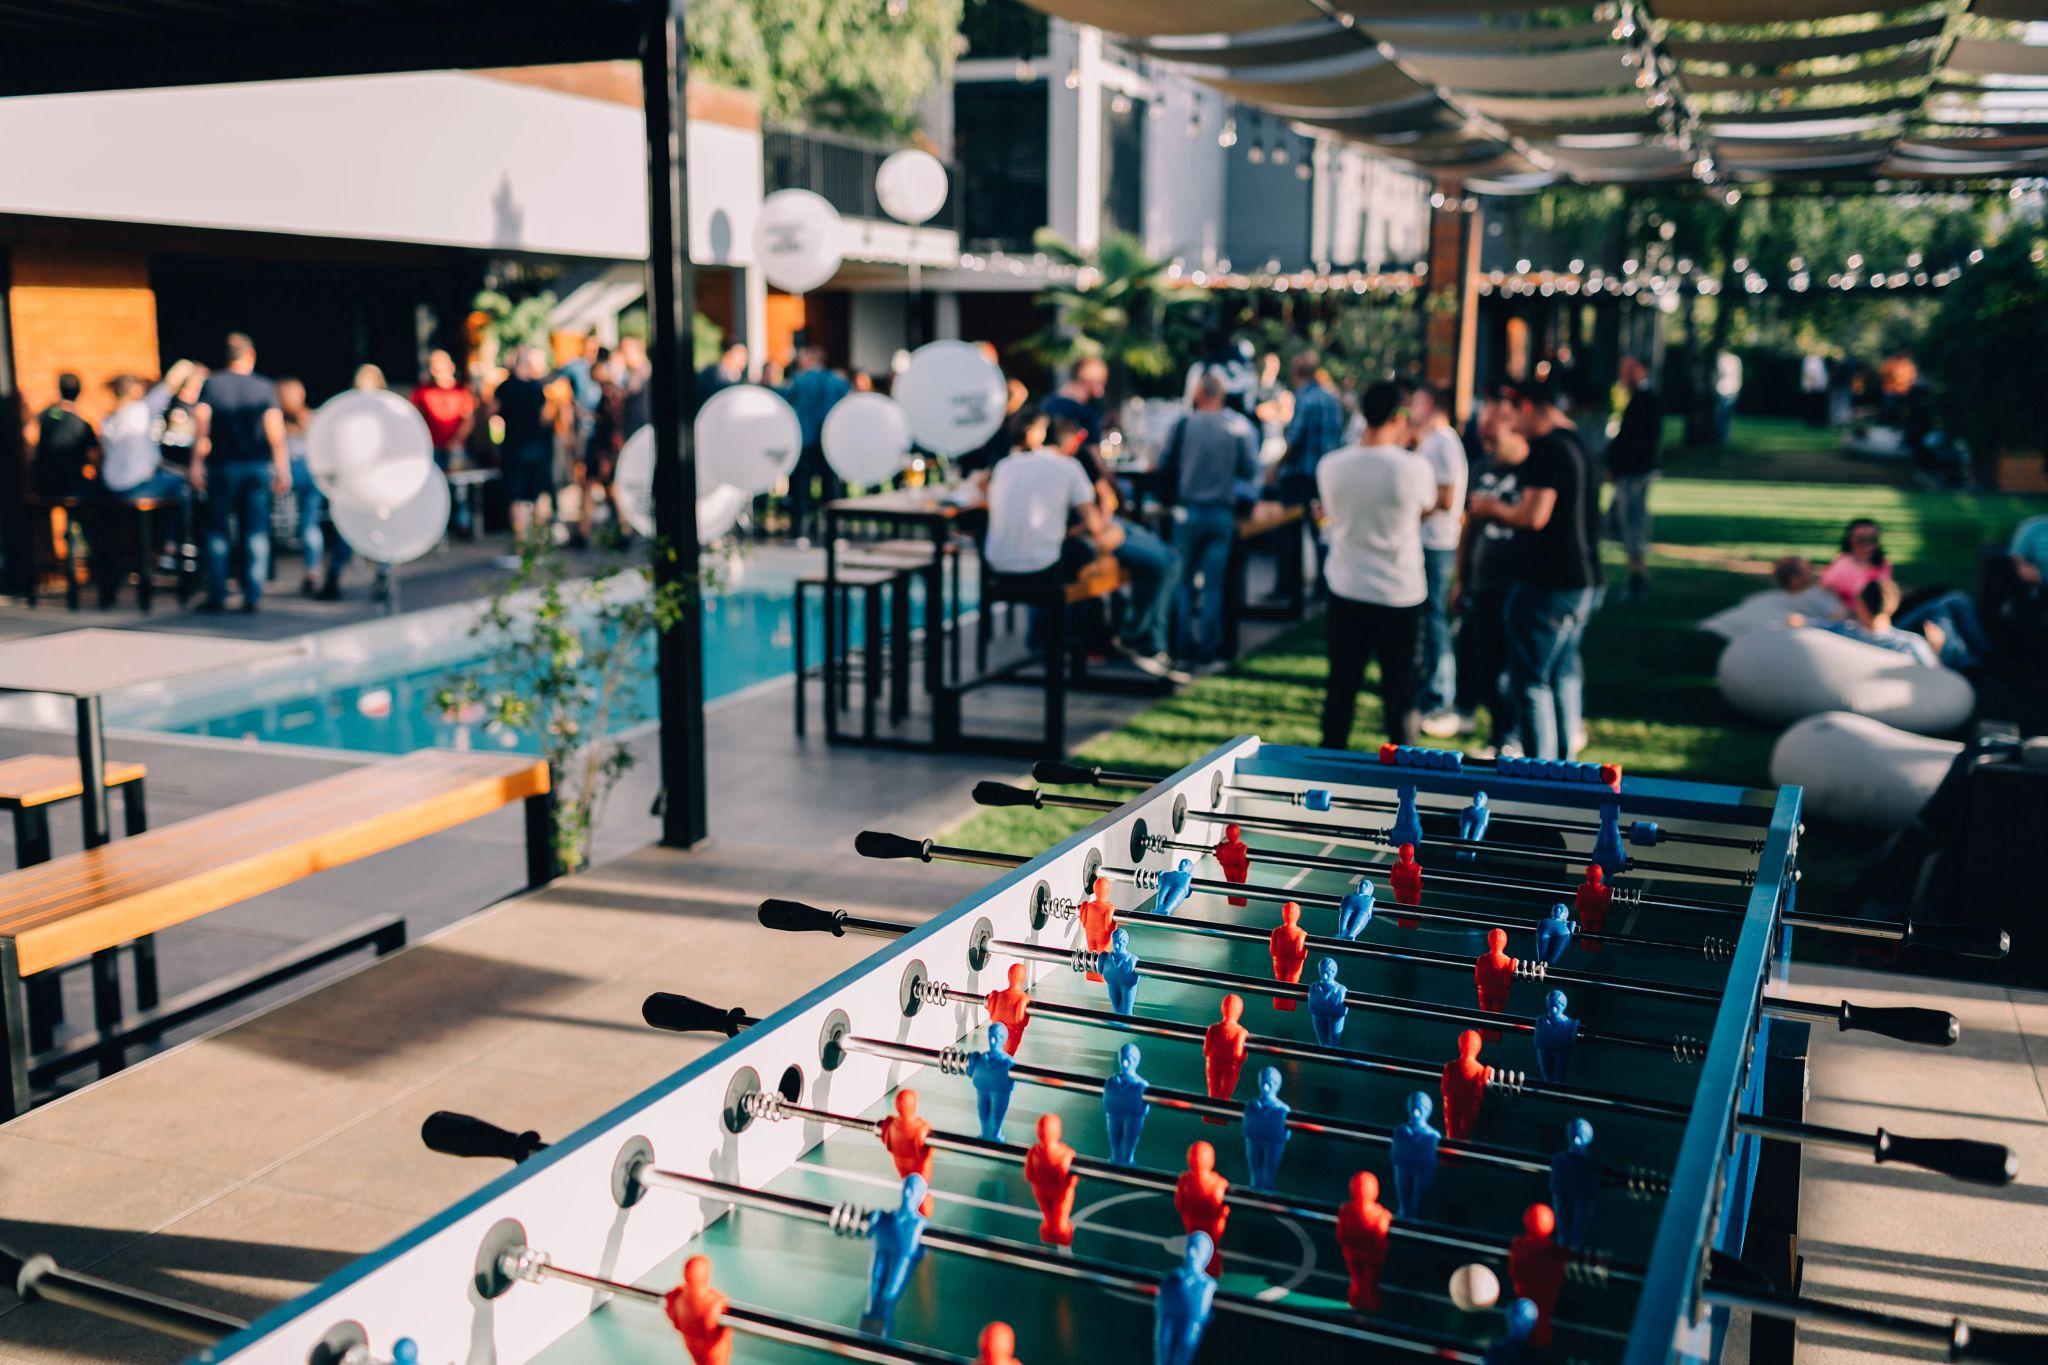 fooseball-table-adults-pool-party-globes-stocksy_txp6a6d40e3hbj200_originaldelivery_2775949.jpg